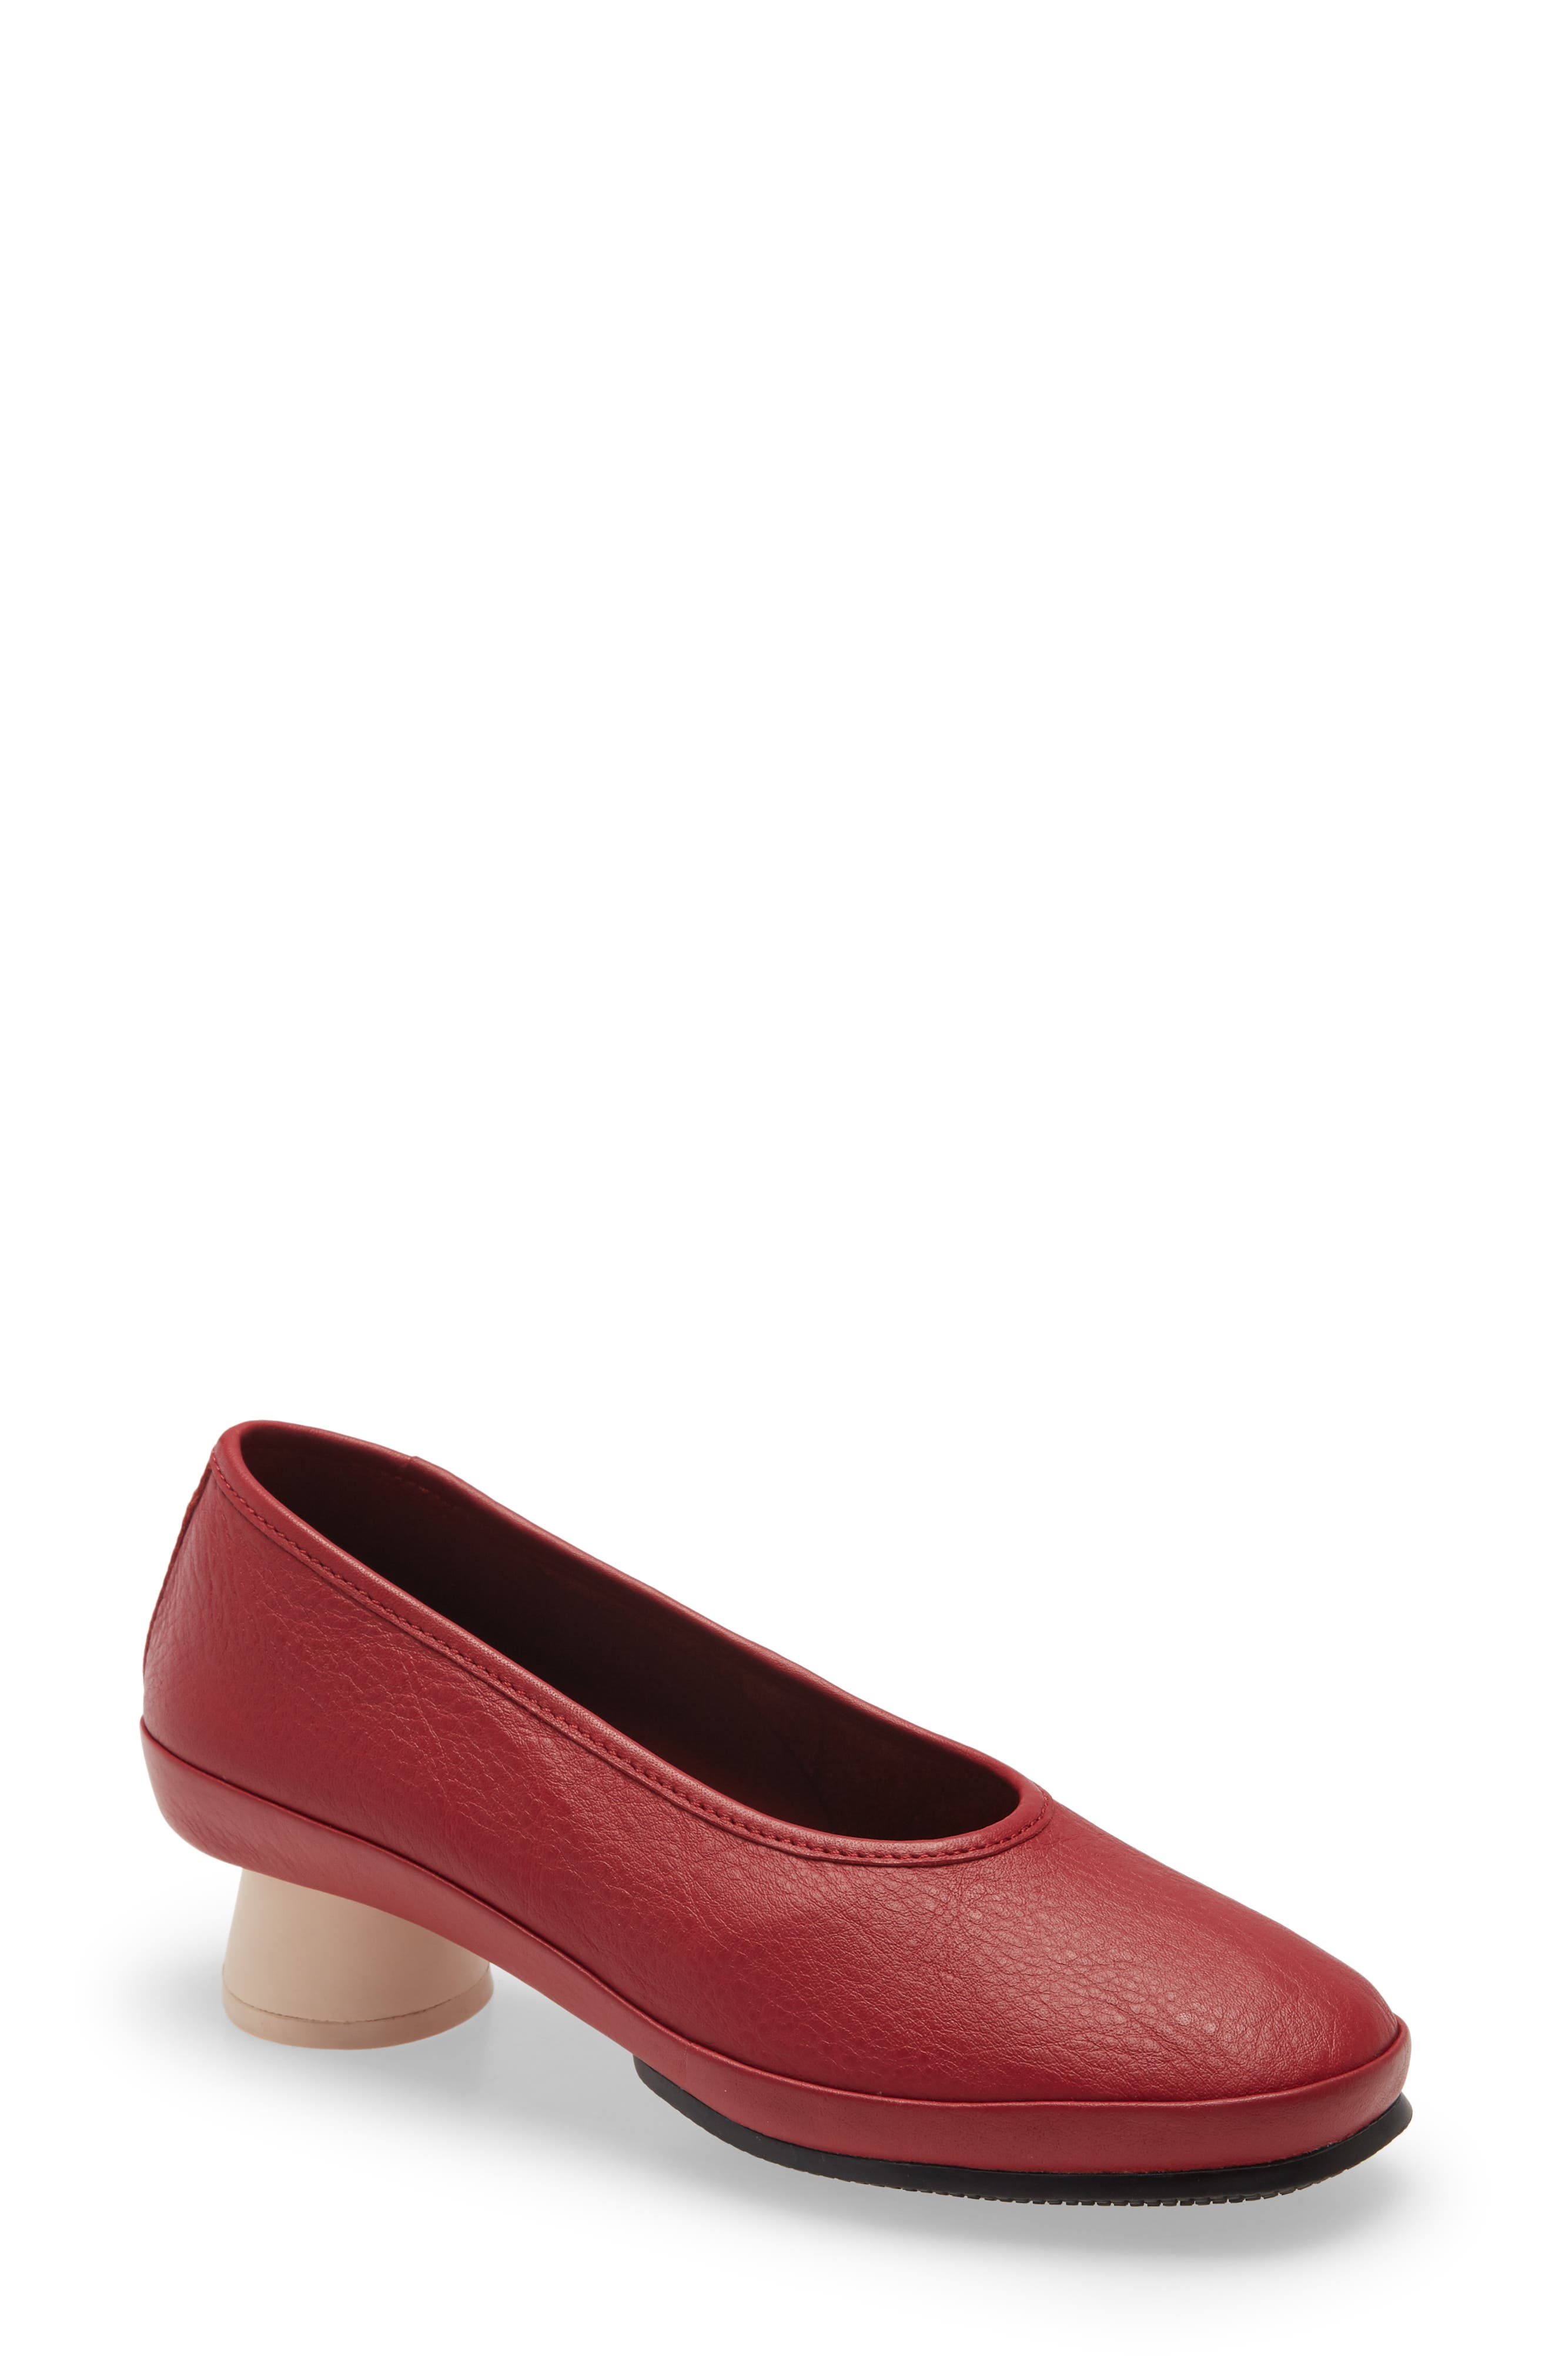 Women's Camper Shoes | Nordstrom